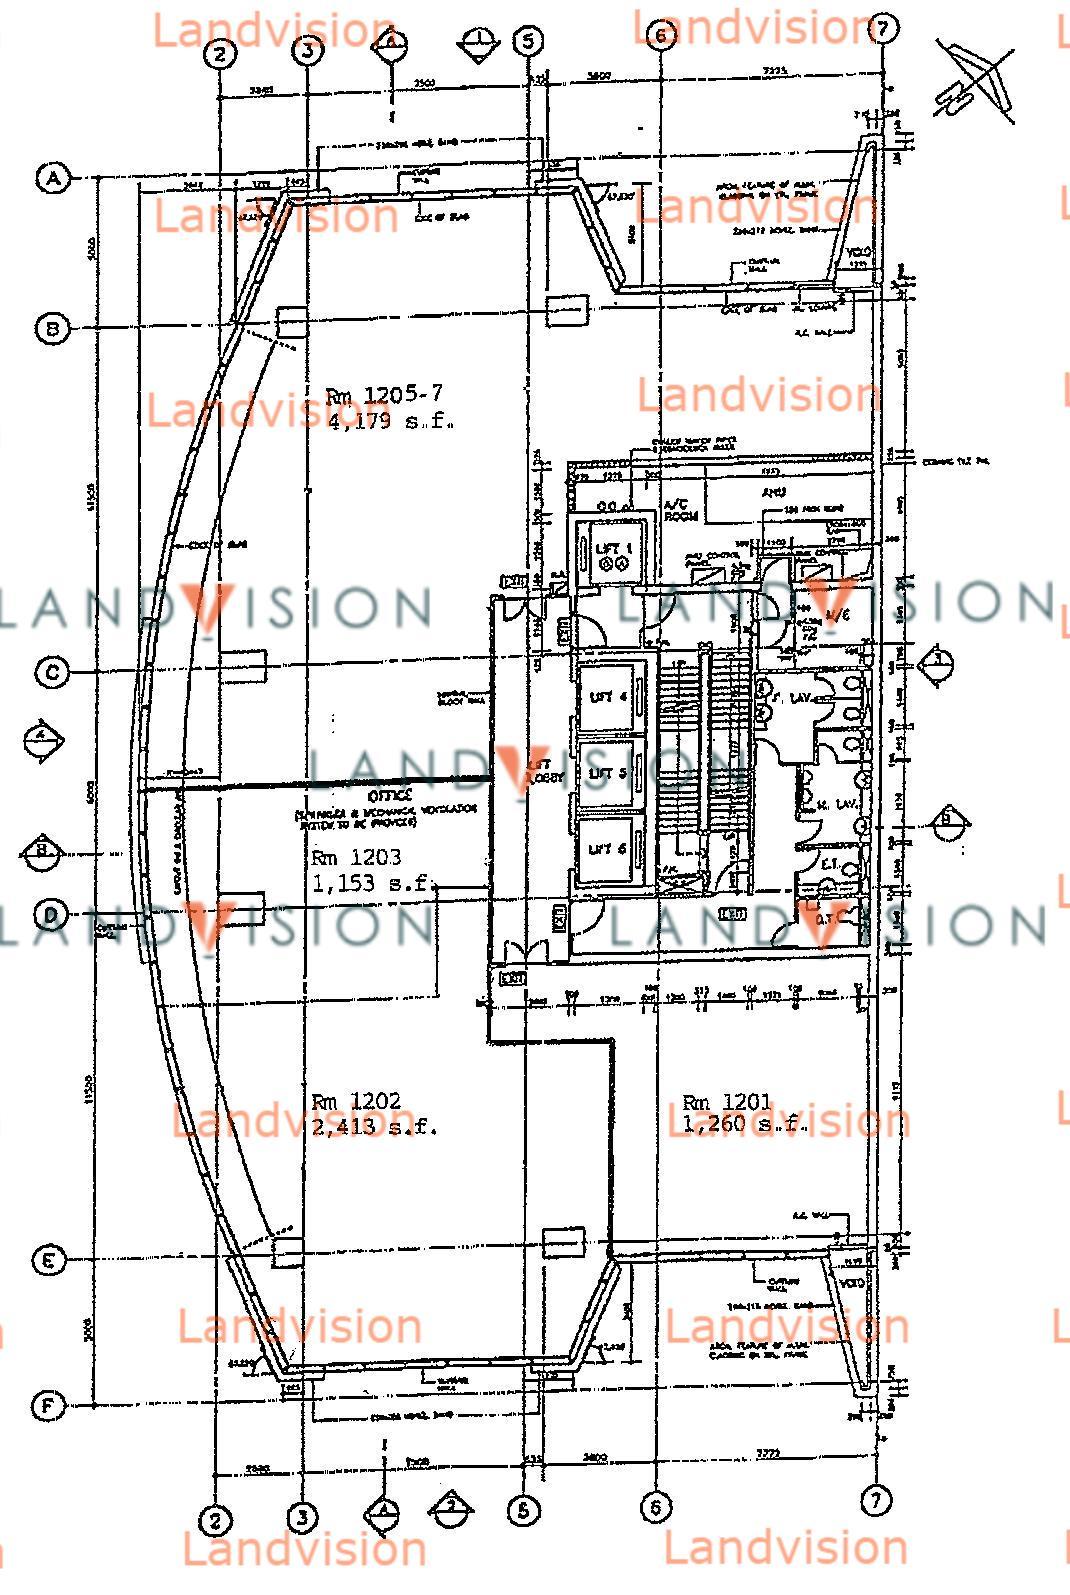 https://www.landvision.com.hk/wp-content/uploads/website/resize/floorplans/000710.JPG